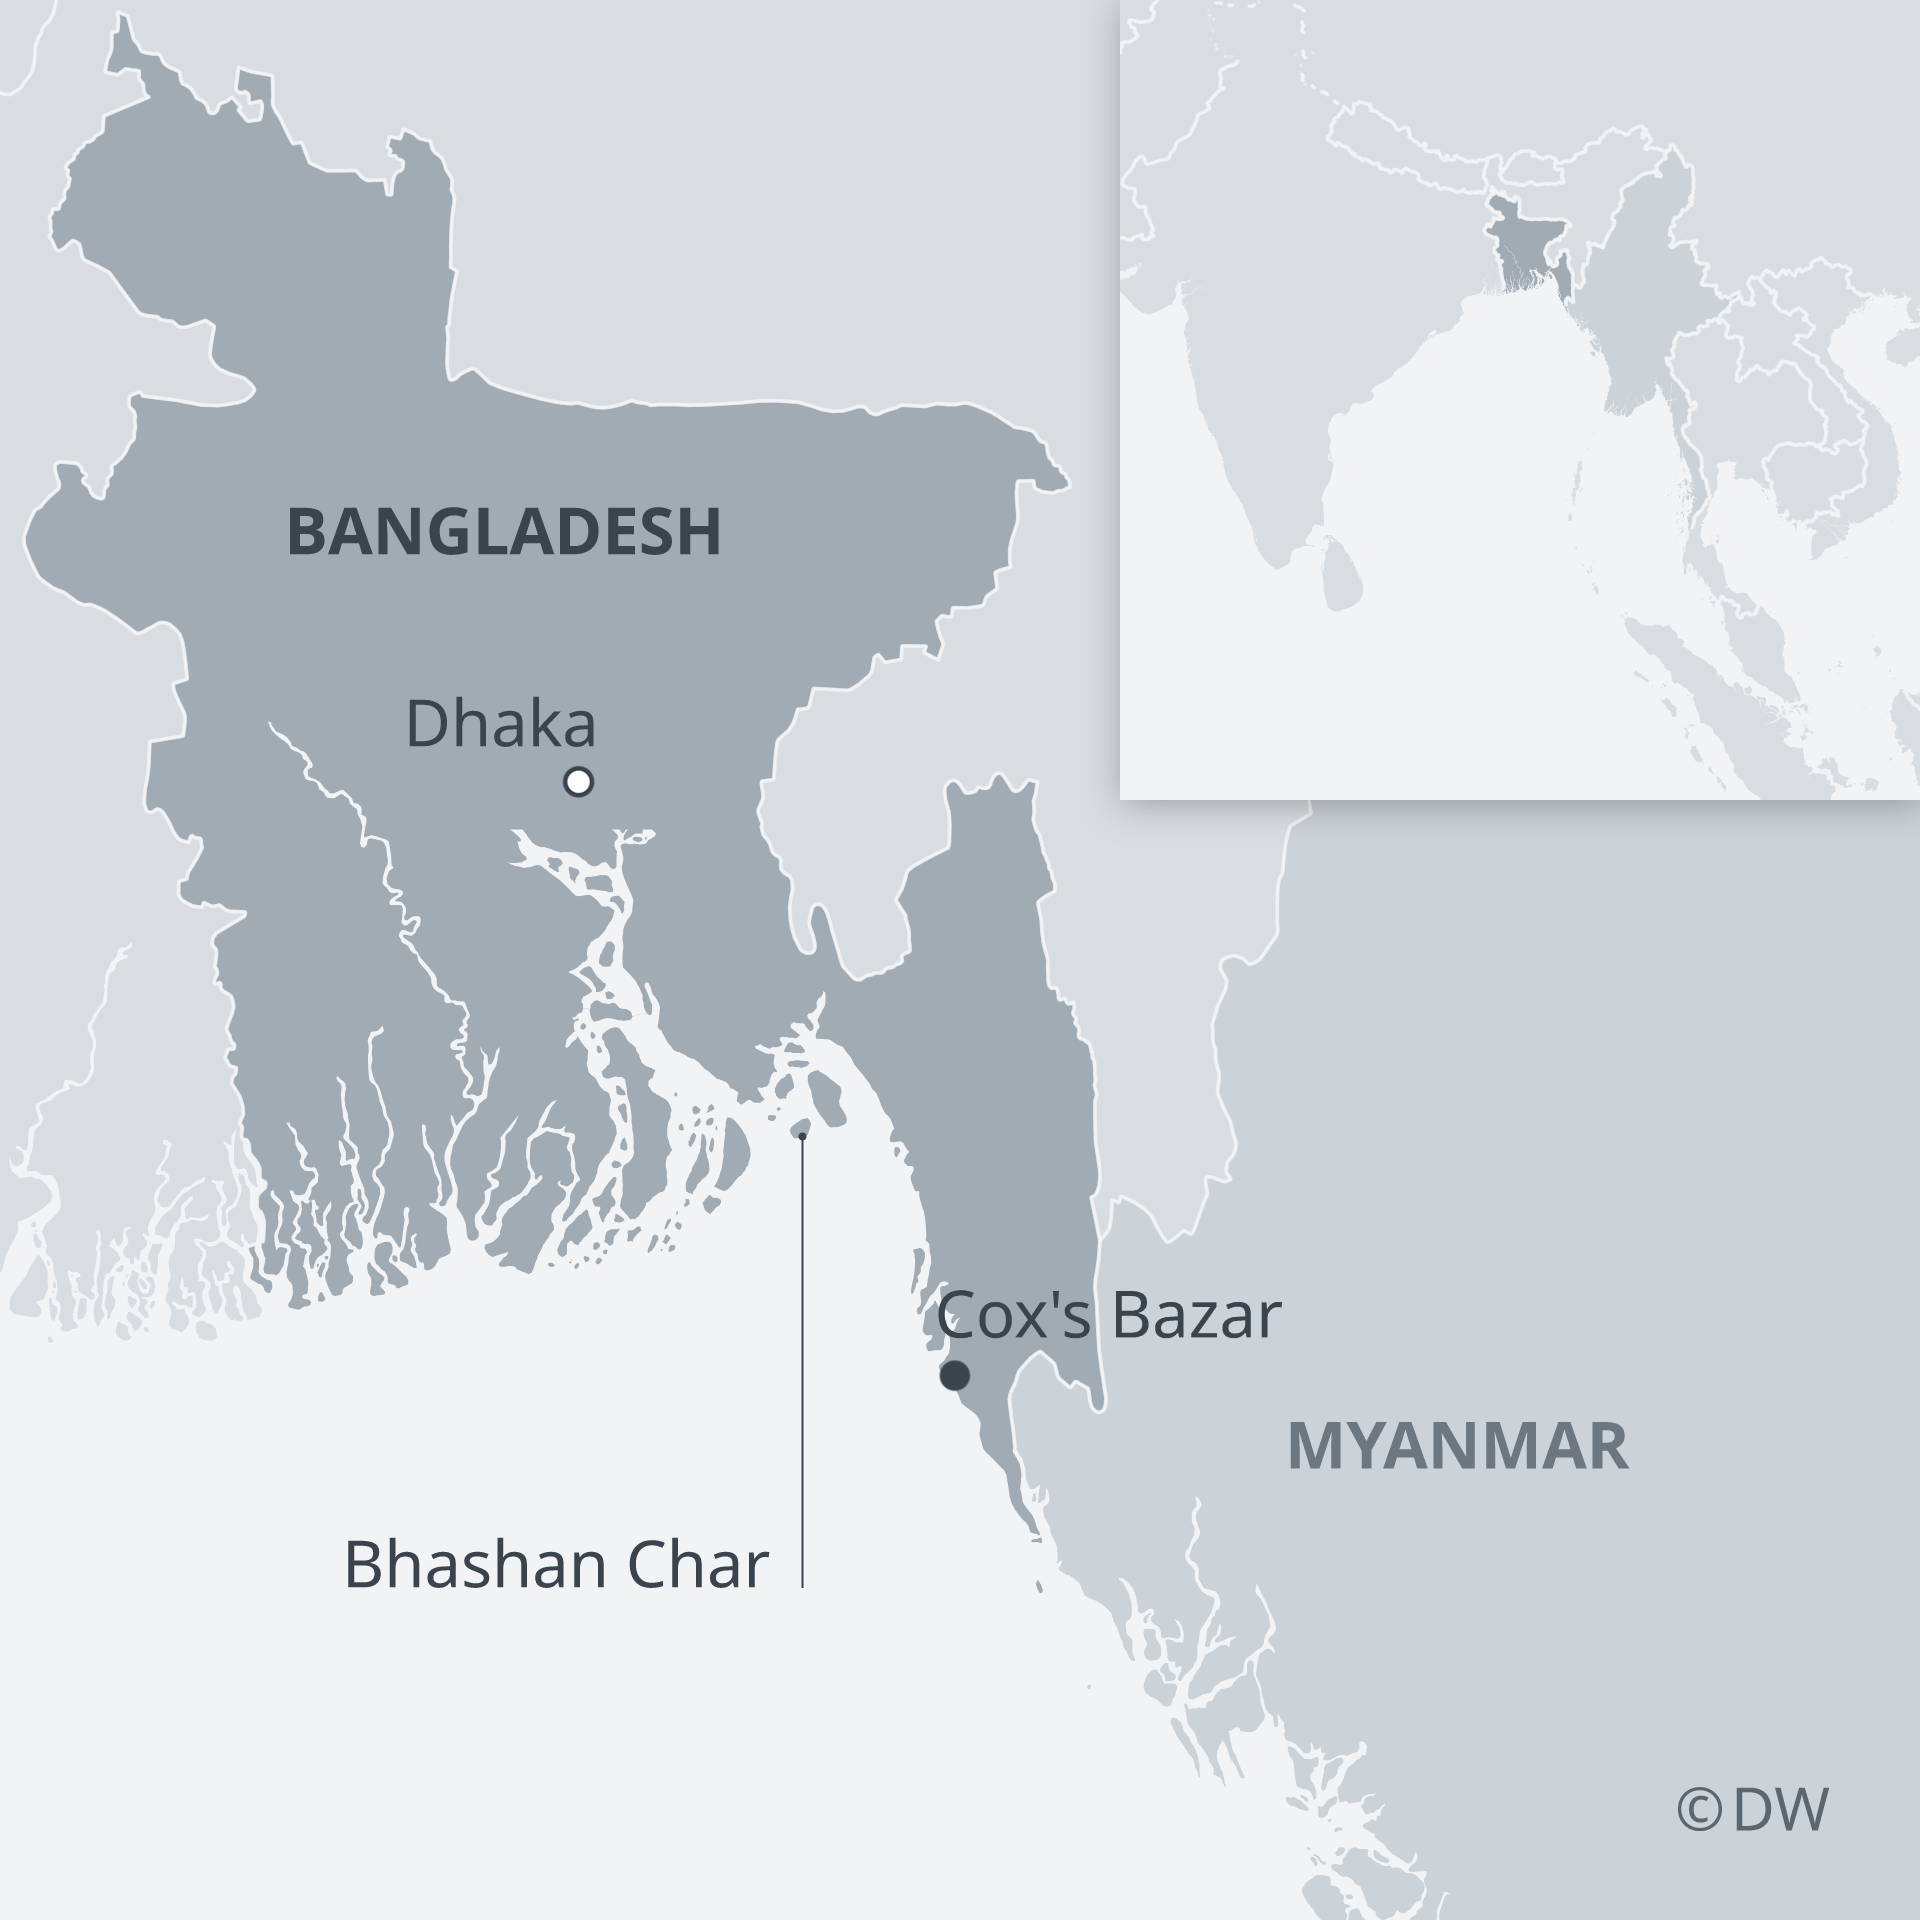 Map of Bhasan Char's location